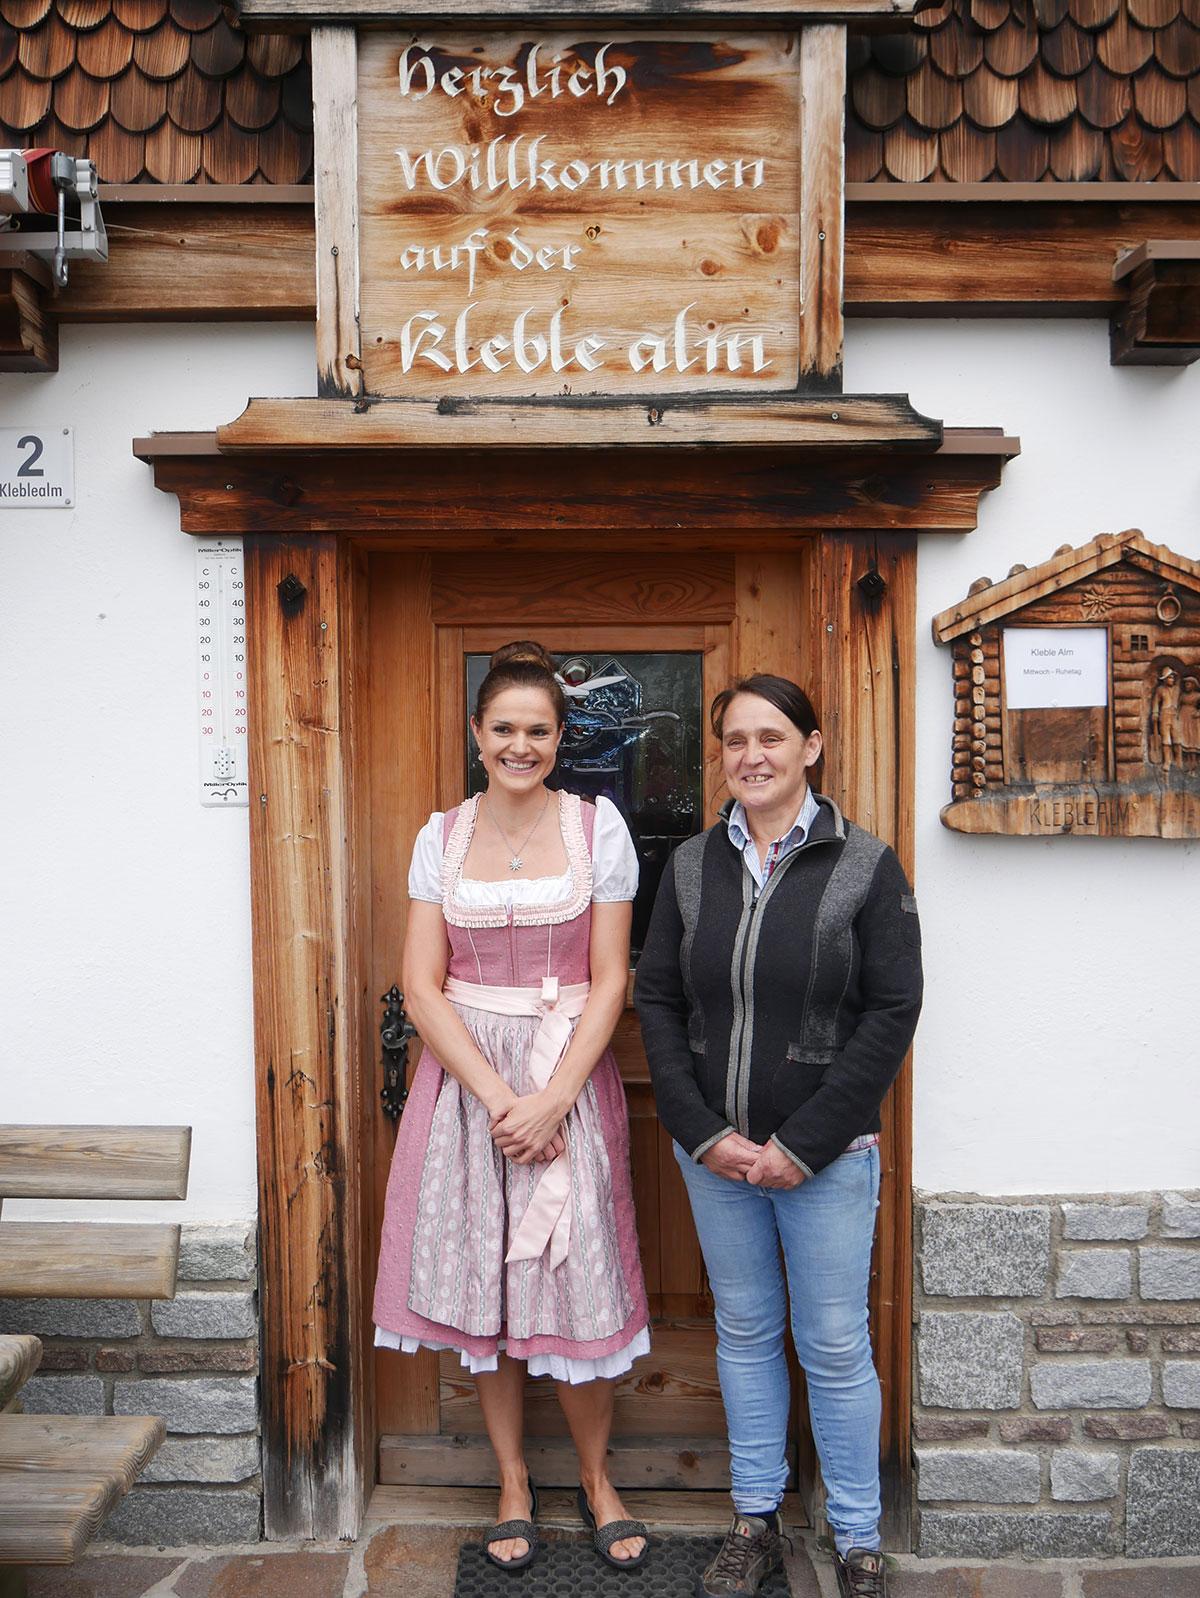 Wirtinnen Kleble Alm - Brauchtum Ötztal Tirol